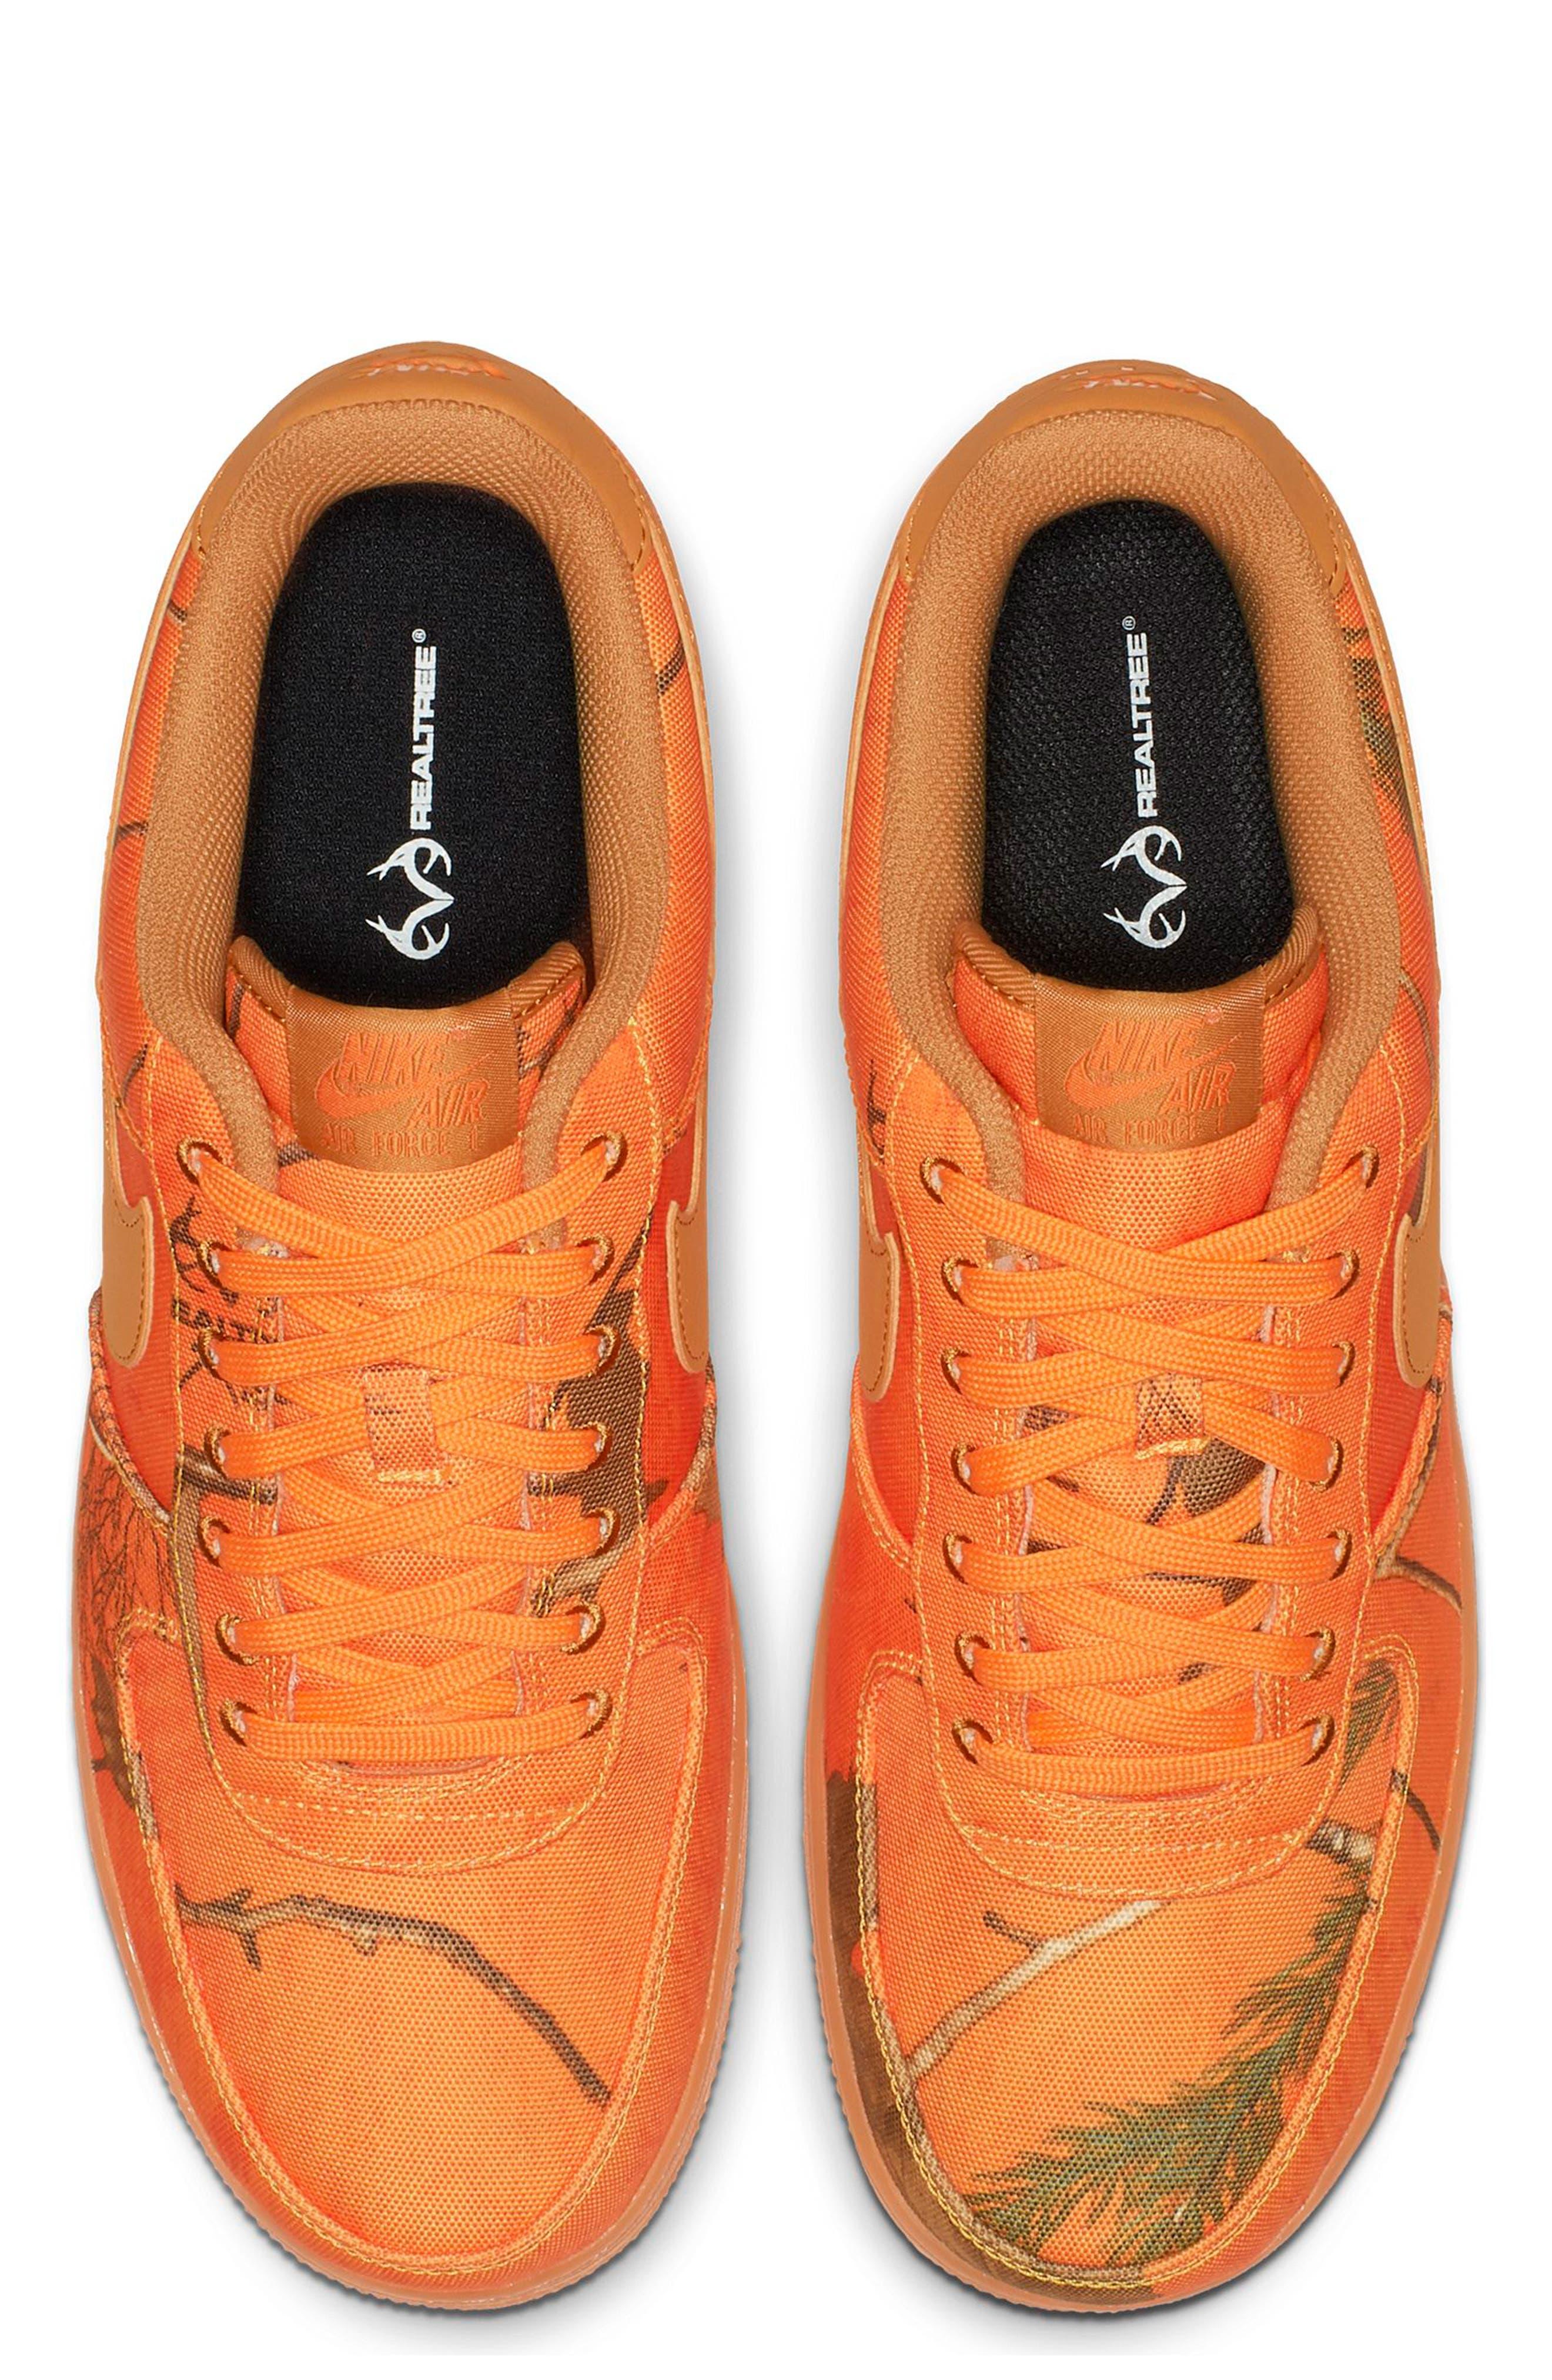 NIKE,                             Air Force 1 '07 LV8 3 Sneaker,                             Alternate thumbnail 4, color,                             ORANGE BLAZE/ WHITE/ BROWN